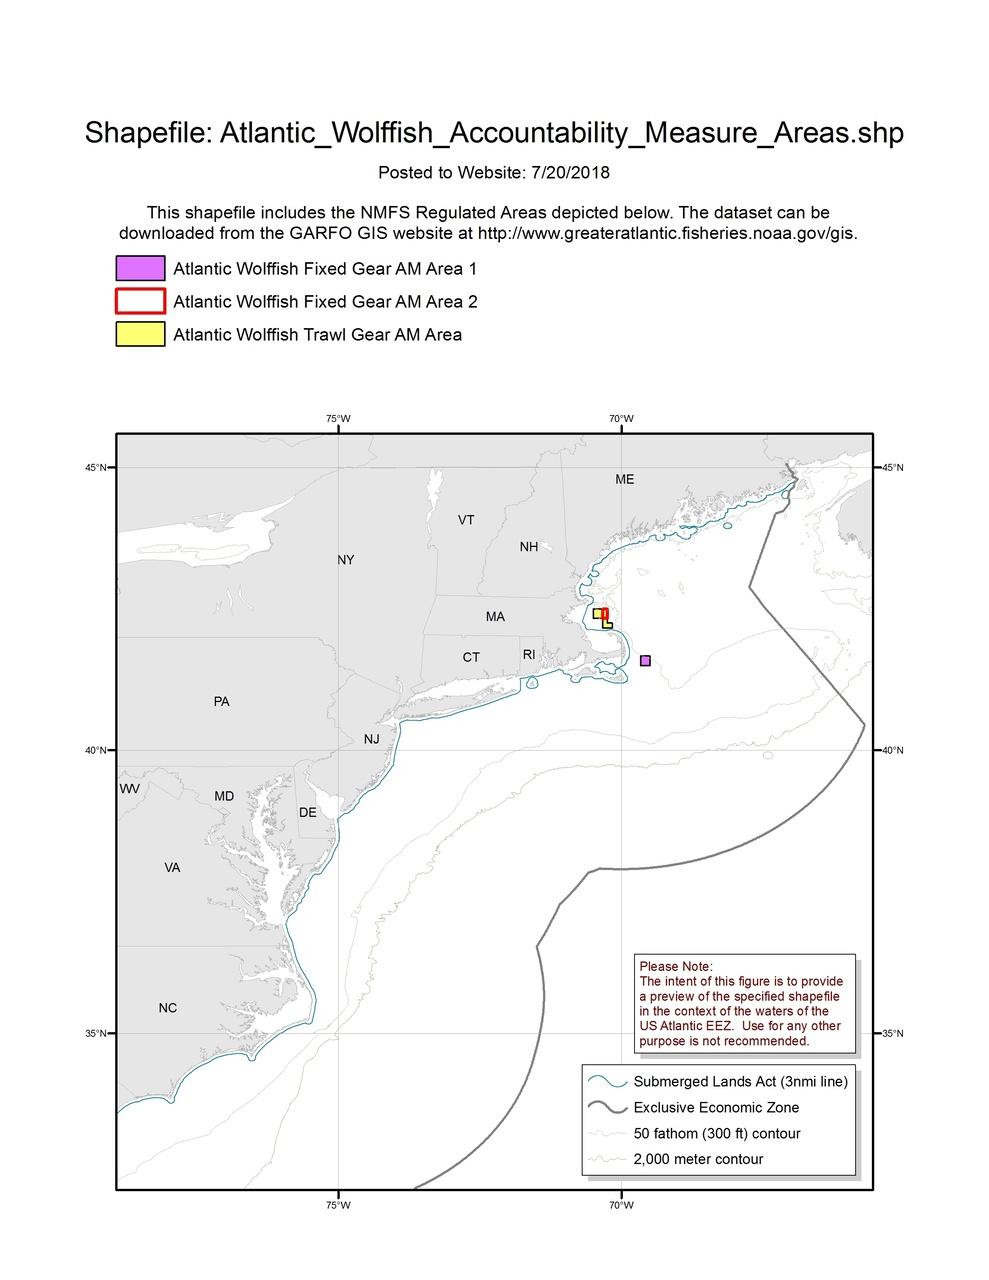 Atlantic_Wolffish_Accountability_Measure_Areas_MAP.jpg